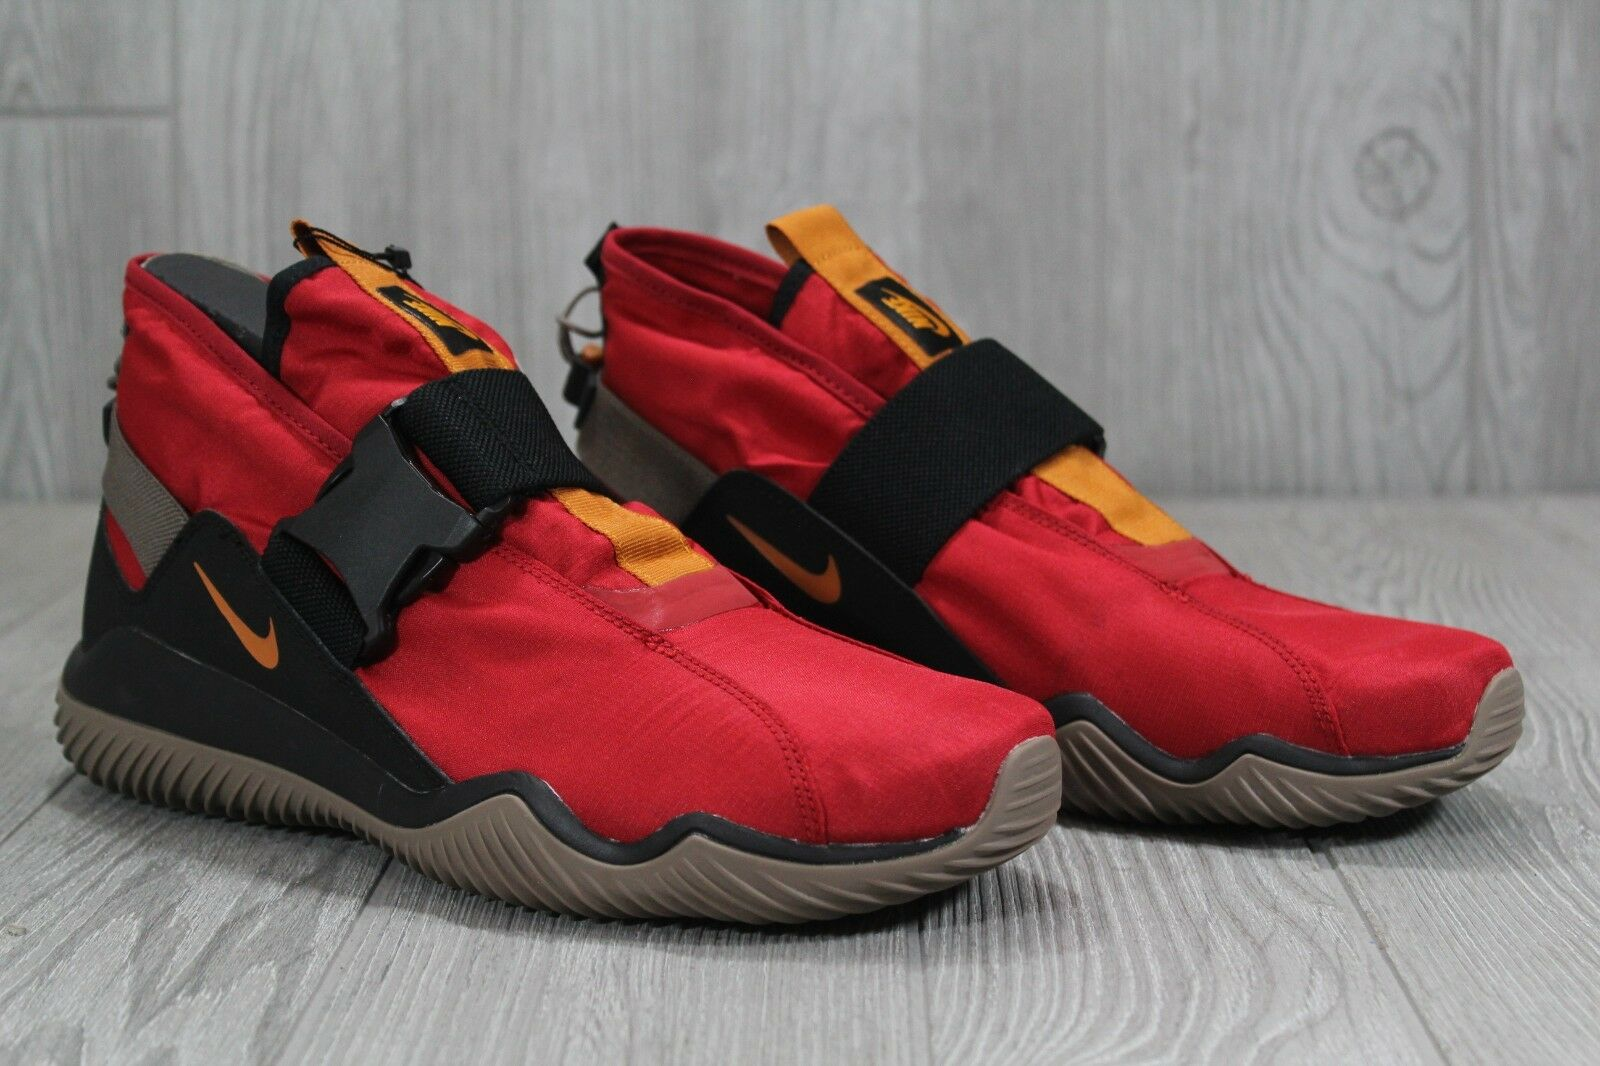 best sneakers e4afb 532f2 ... 36 New Nike Komyuter ESS Gym Gym Gym Red Black shoes AQ8131 600 Mens  Size 10 ...